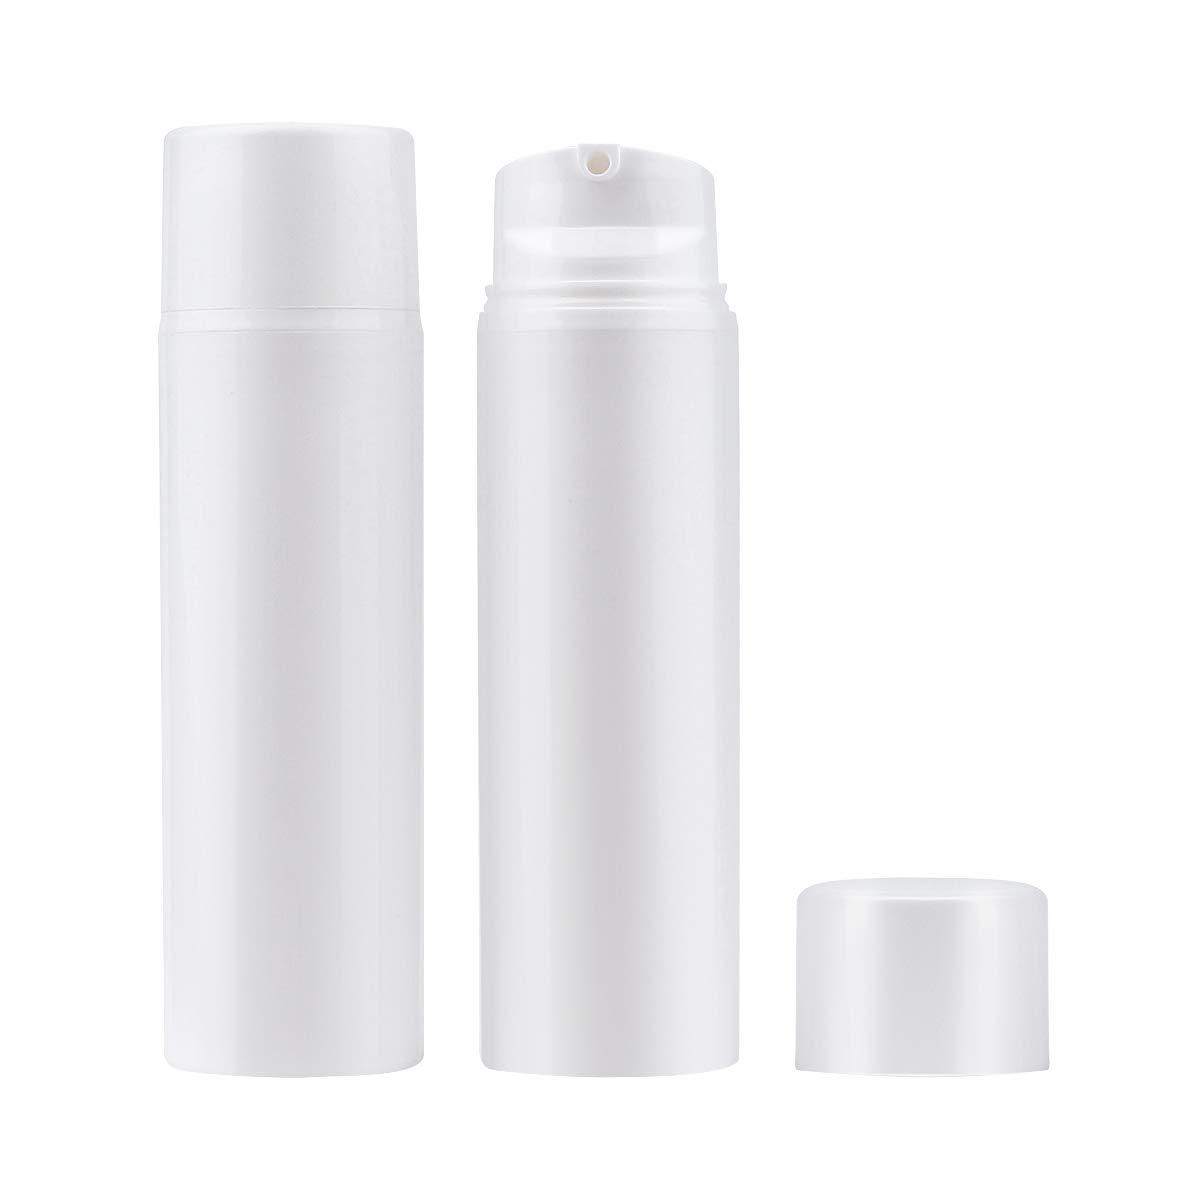 Yebeauty 120ml/4oz Plastic Disposable Airless Pump Vacuum Bottles 2pcs - Empty Bottles Lotion Dispenser Makeup Emulsion for Leak Proof Shockproof Travel